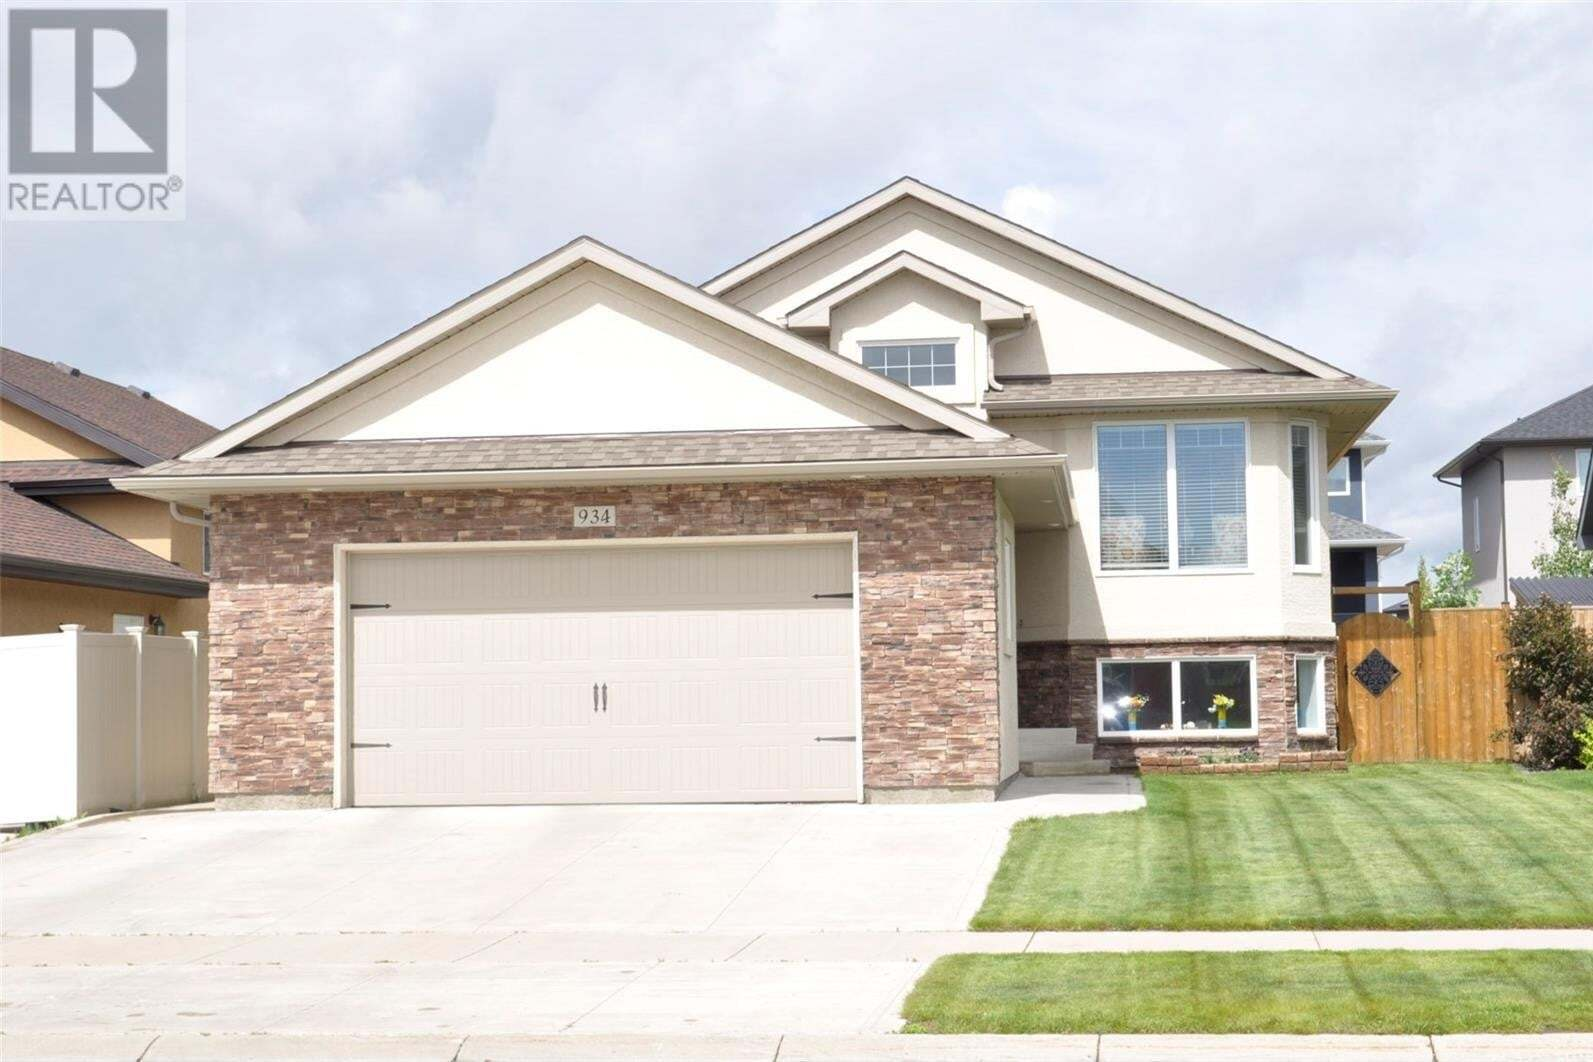 House for sale at 934 Hunter Rd Saskatoon Saskatchewan - MLS: SK815247